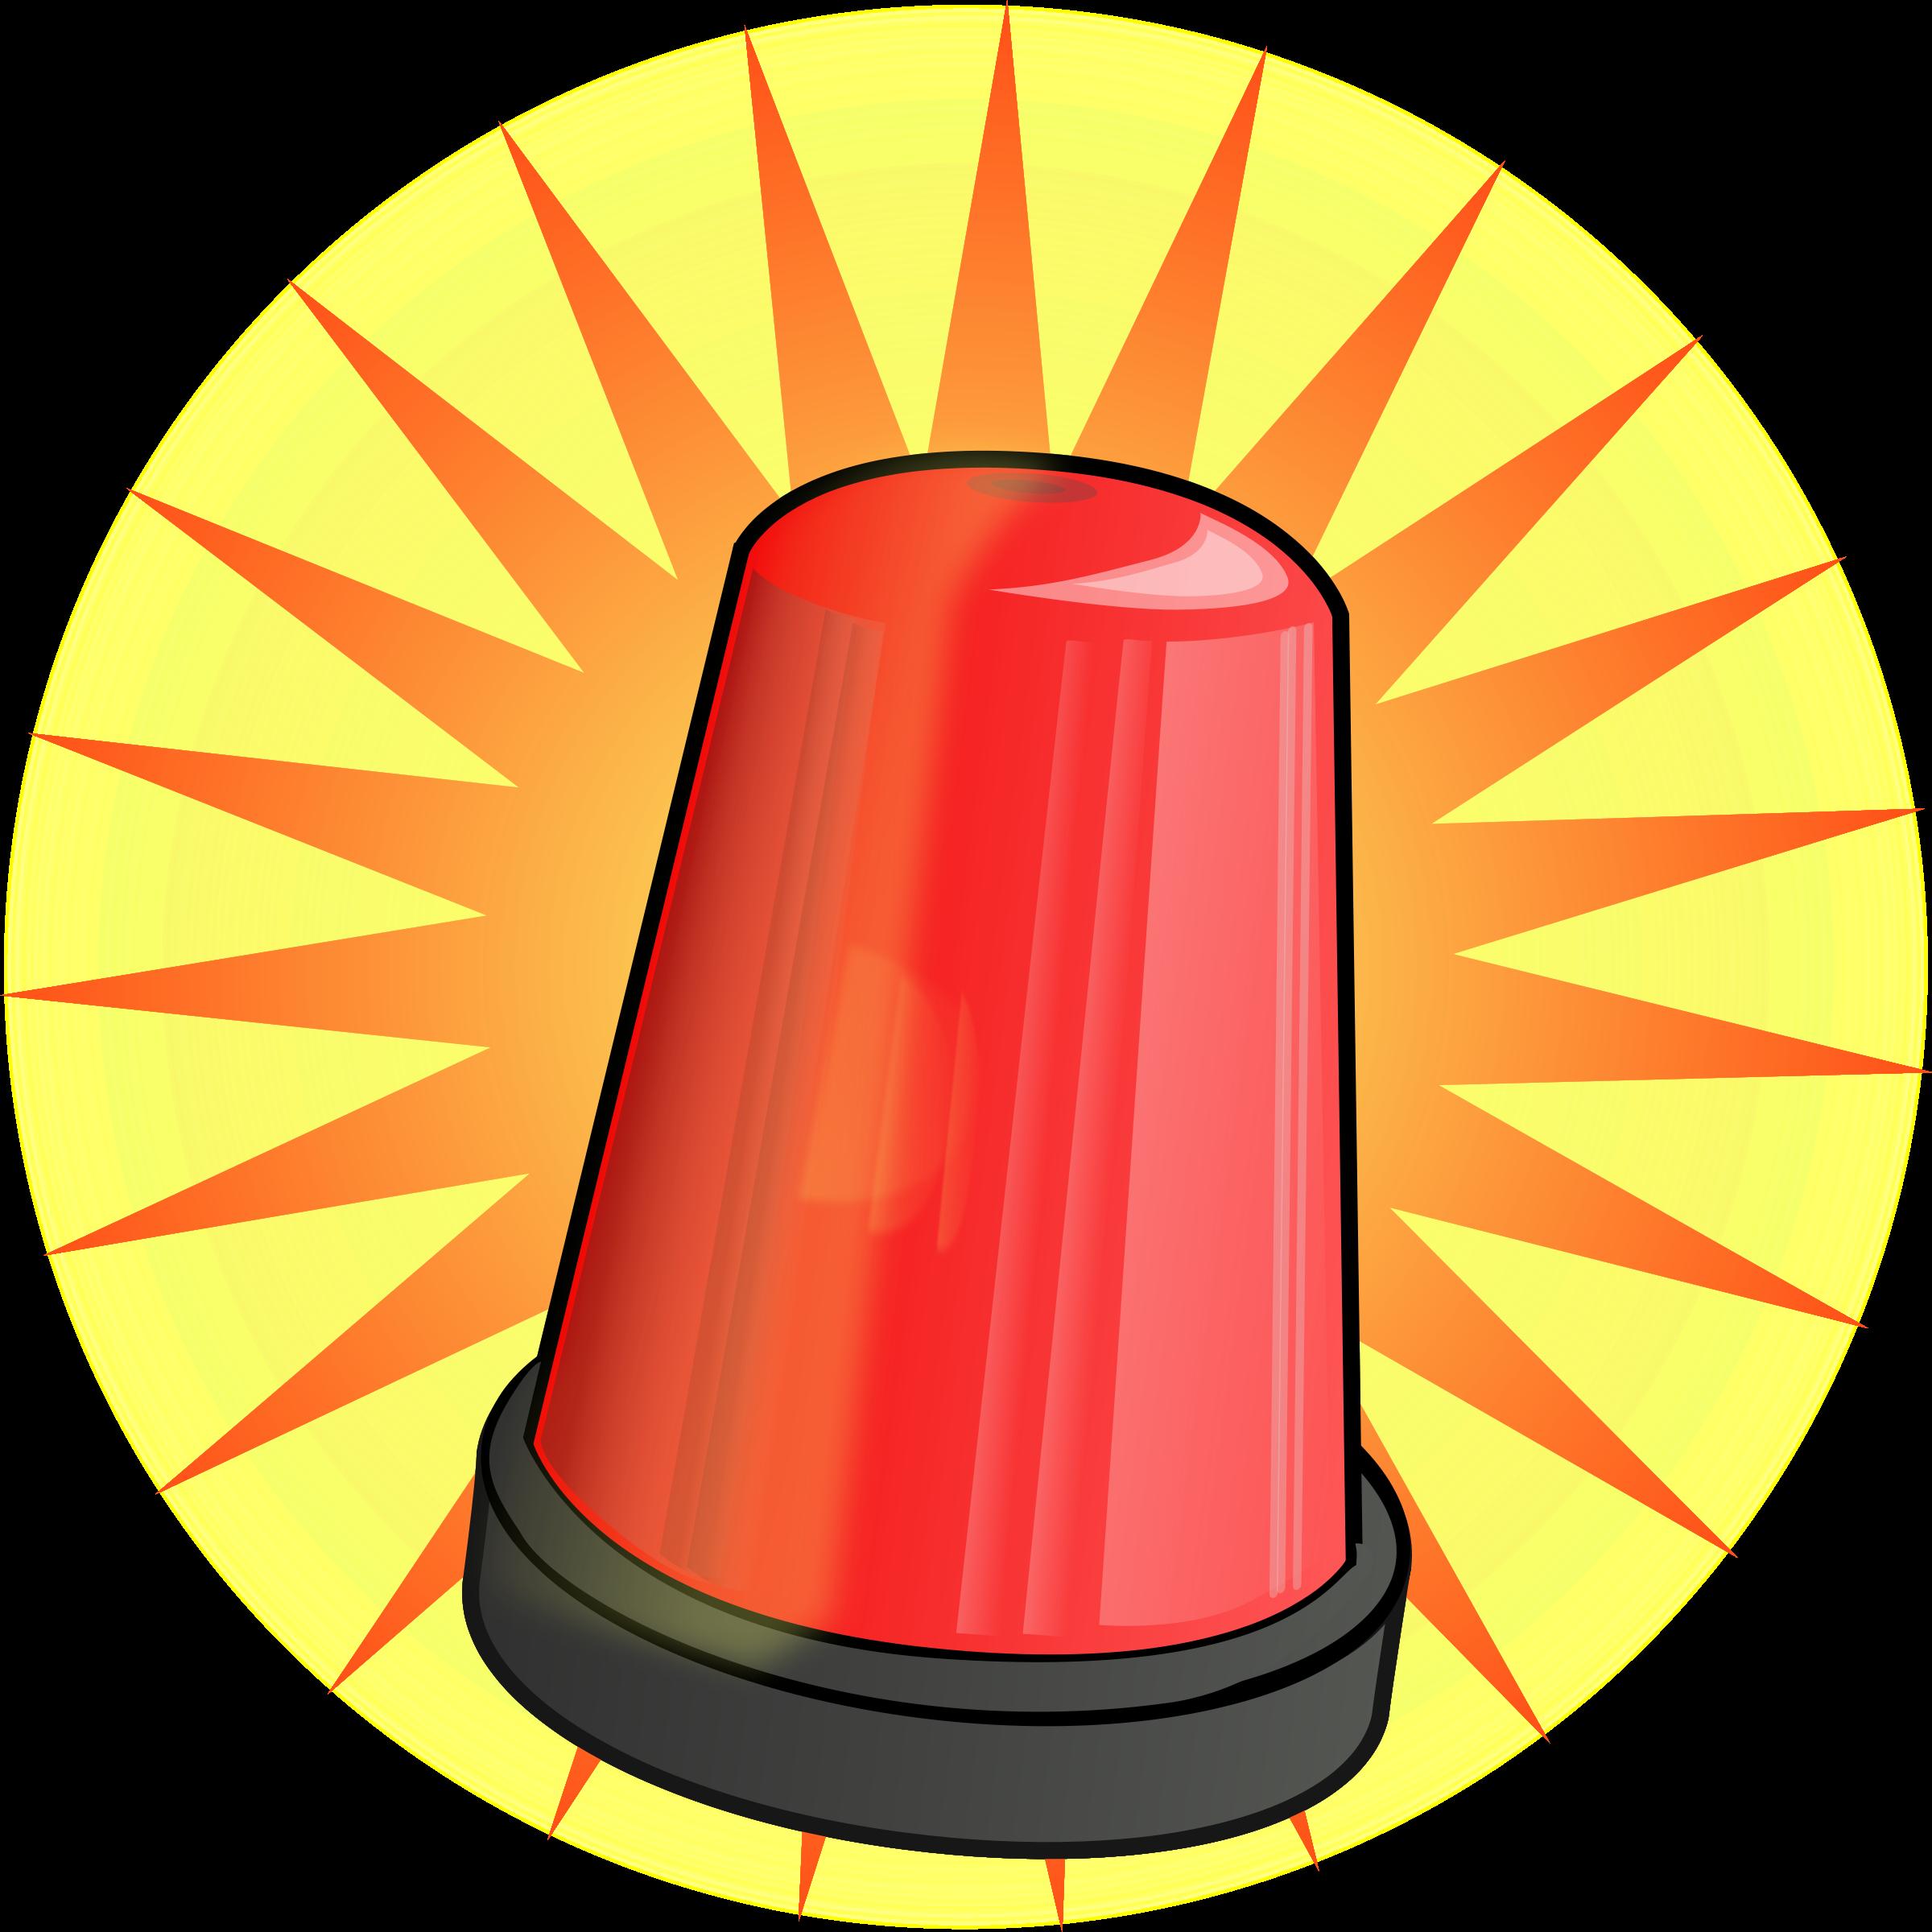 Emergency clipart siren Siren Download Clip Free Clipart